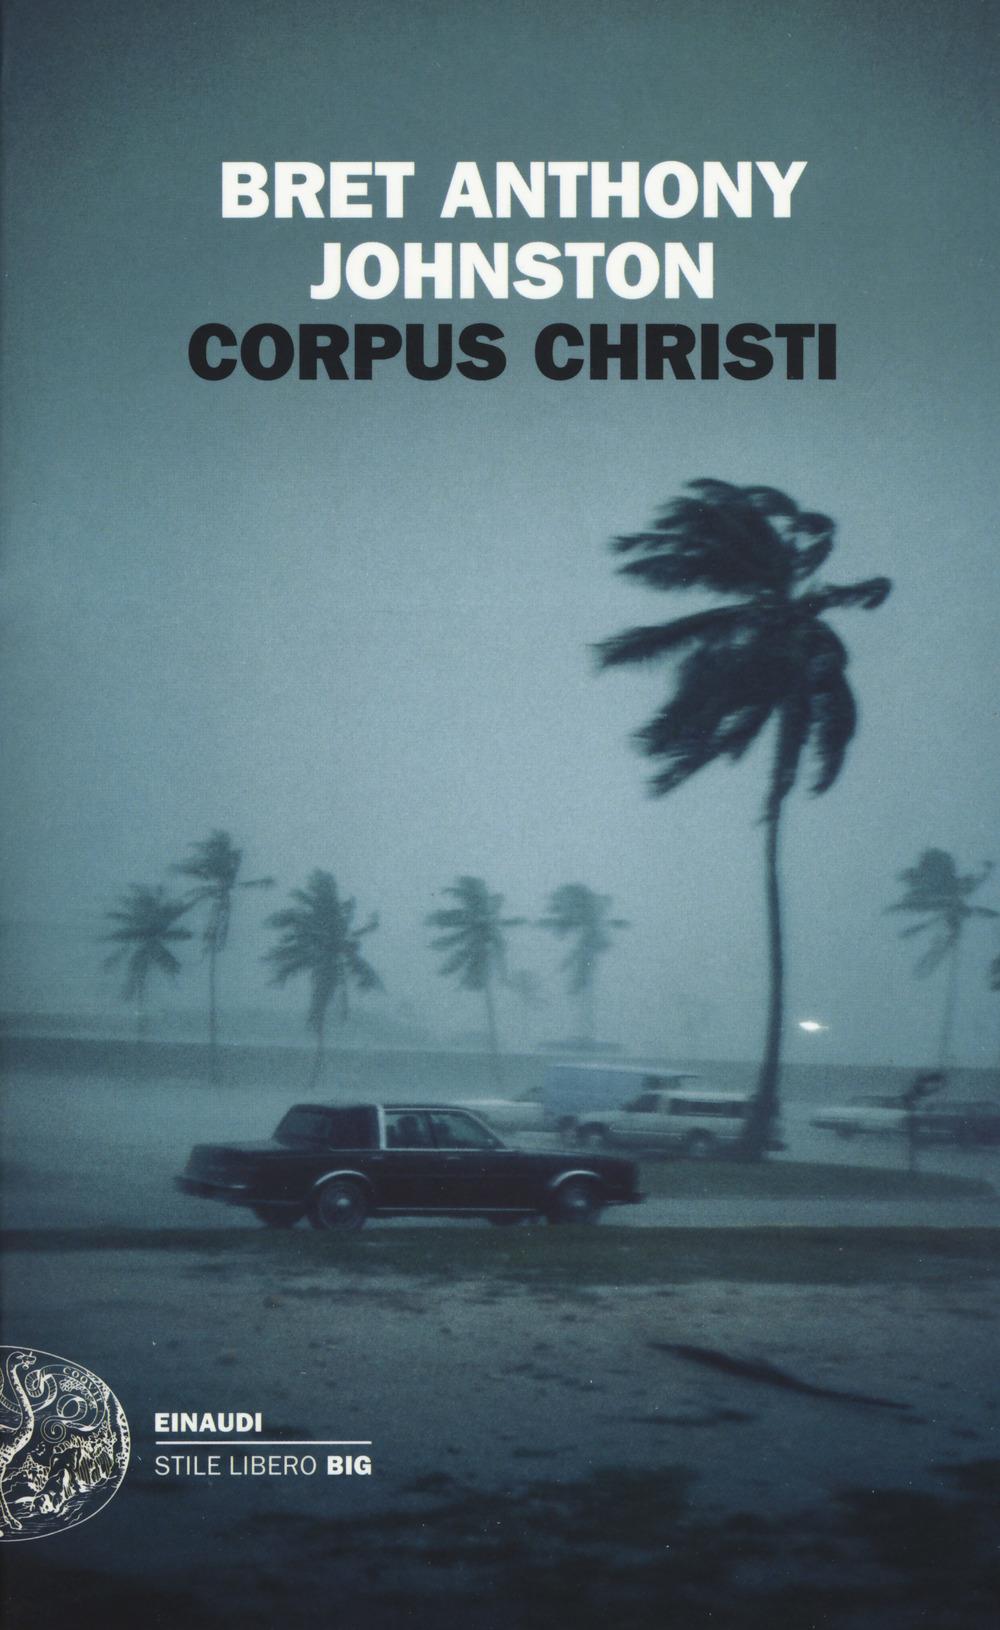 CORPUS CHRISTI - 9788806231088